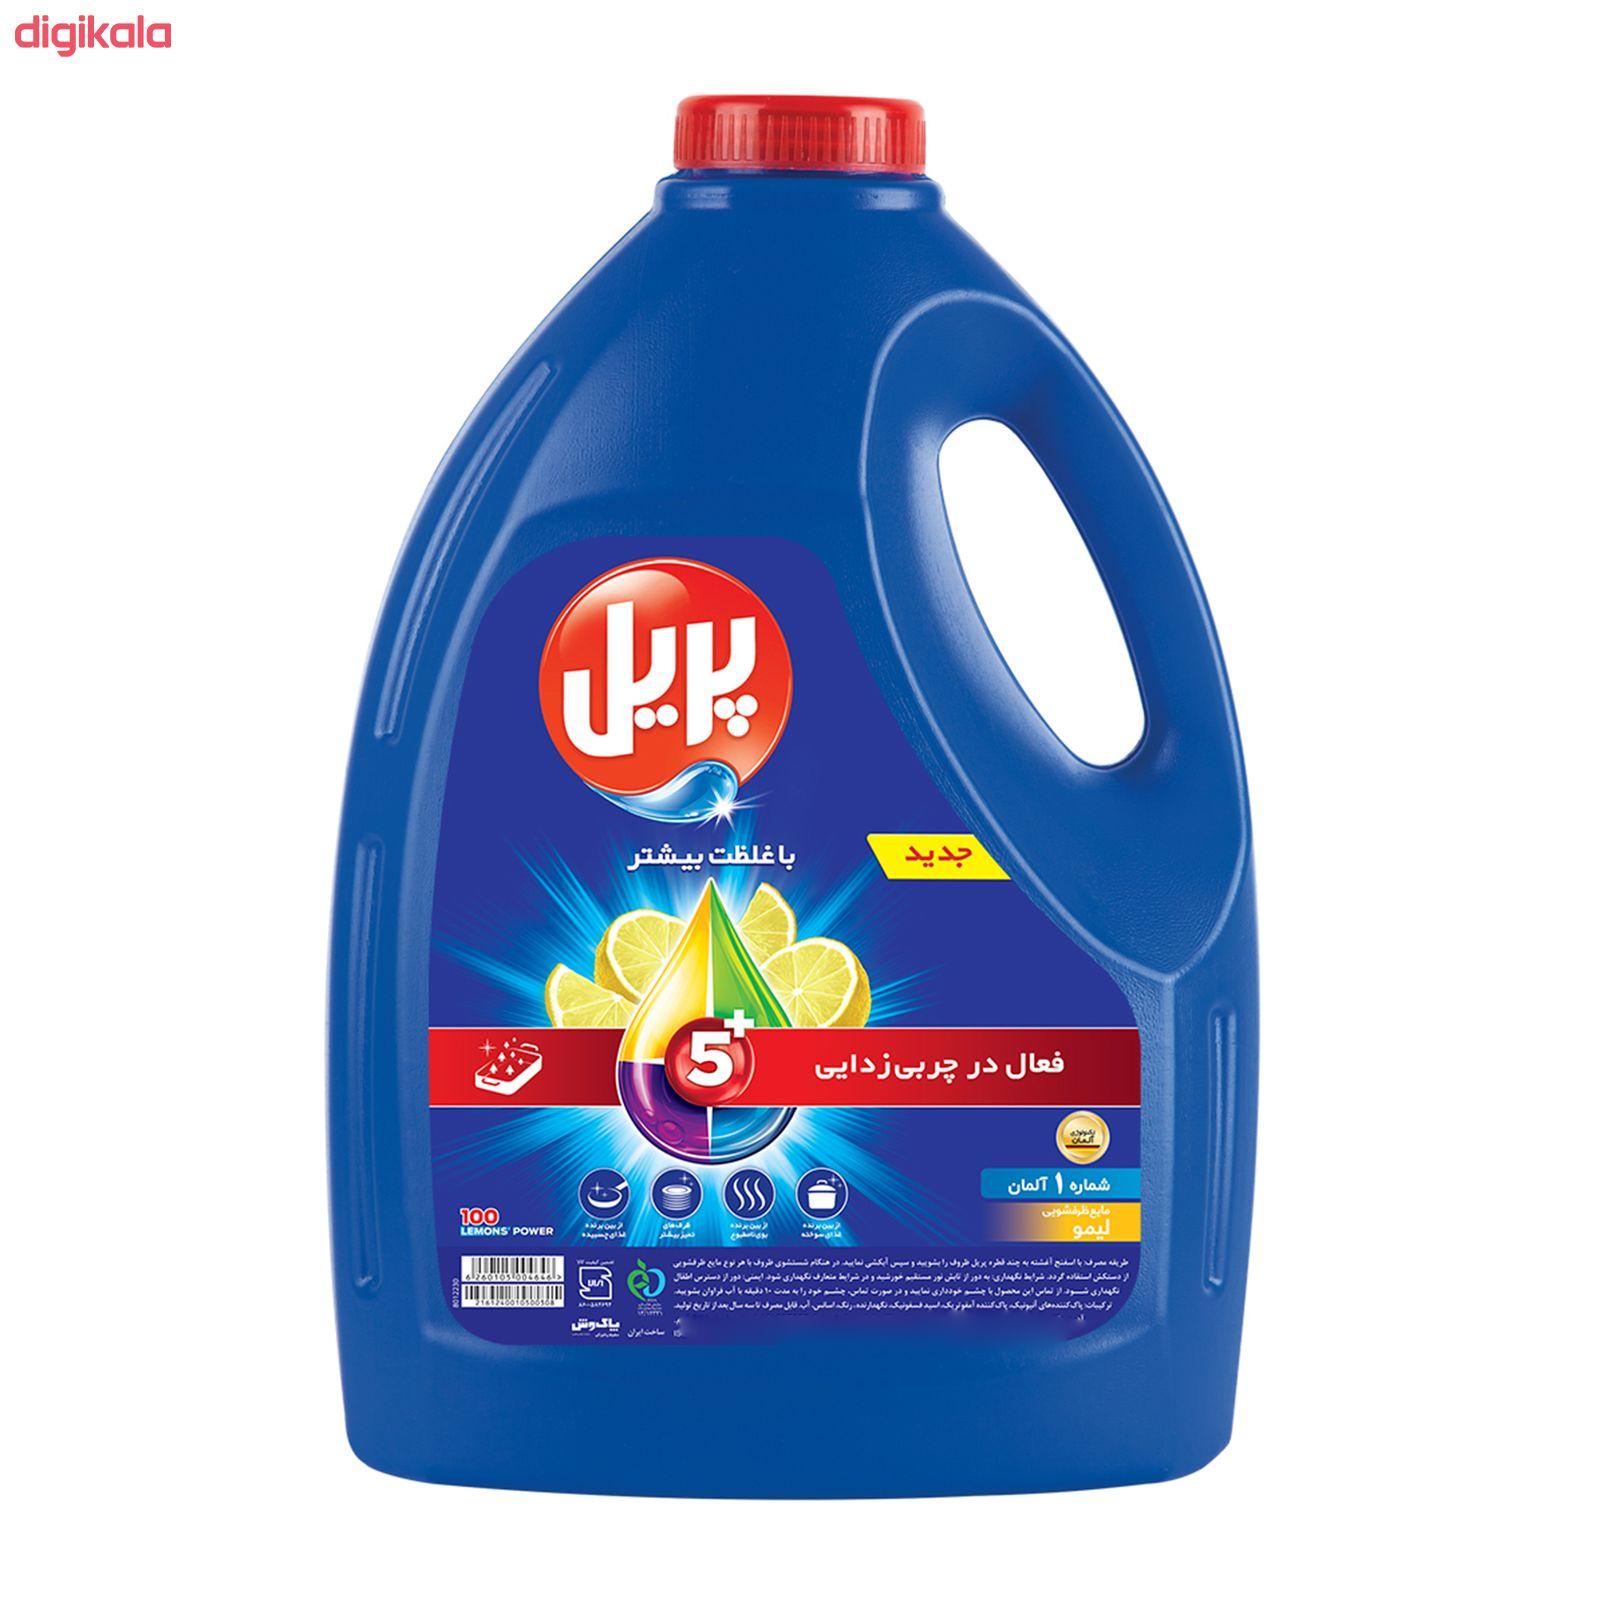 مایع ظرفشویی پریل مدل Lemon حجم 3.75 لیتر main 1 1